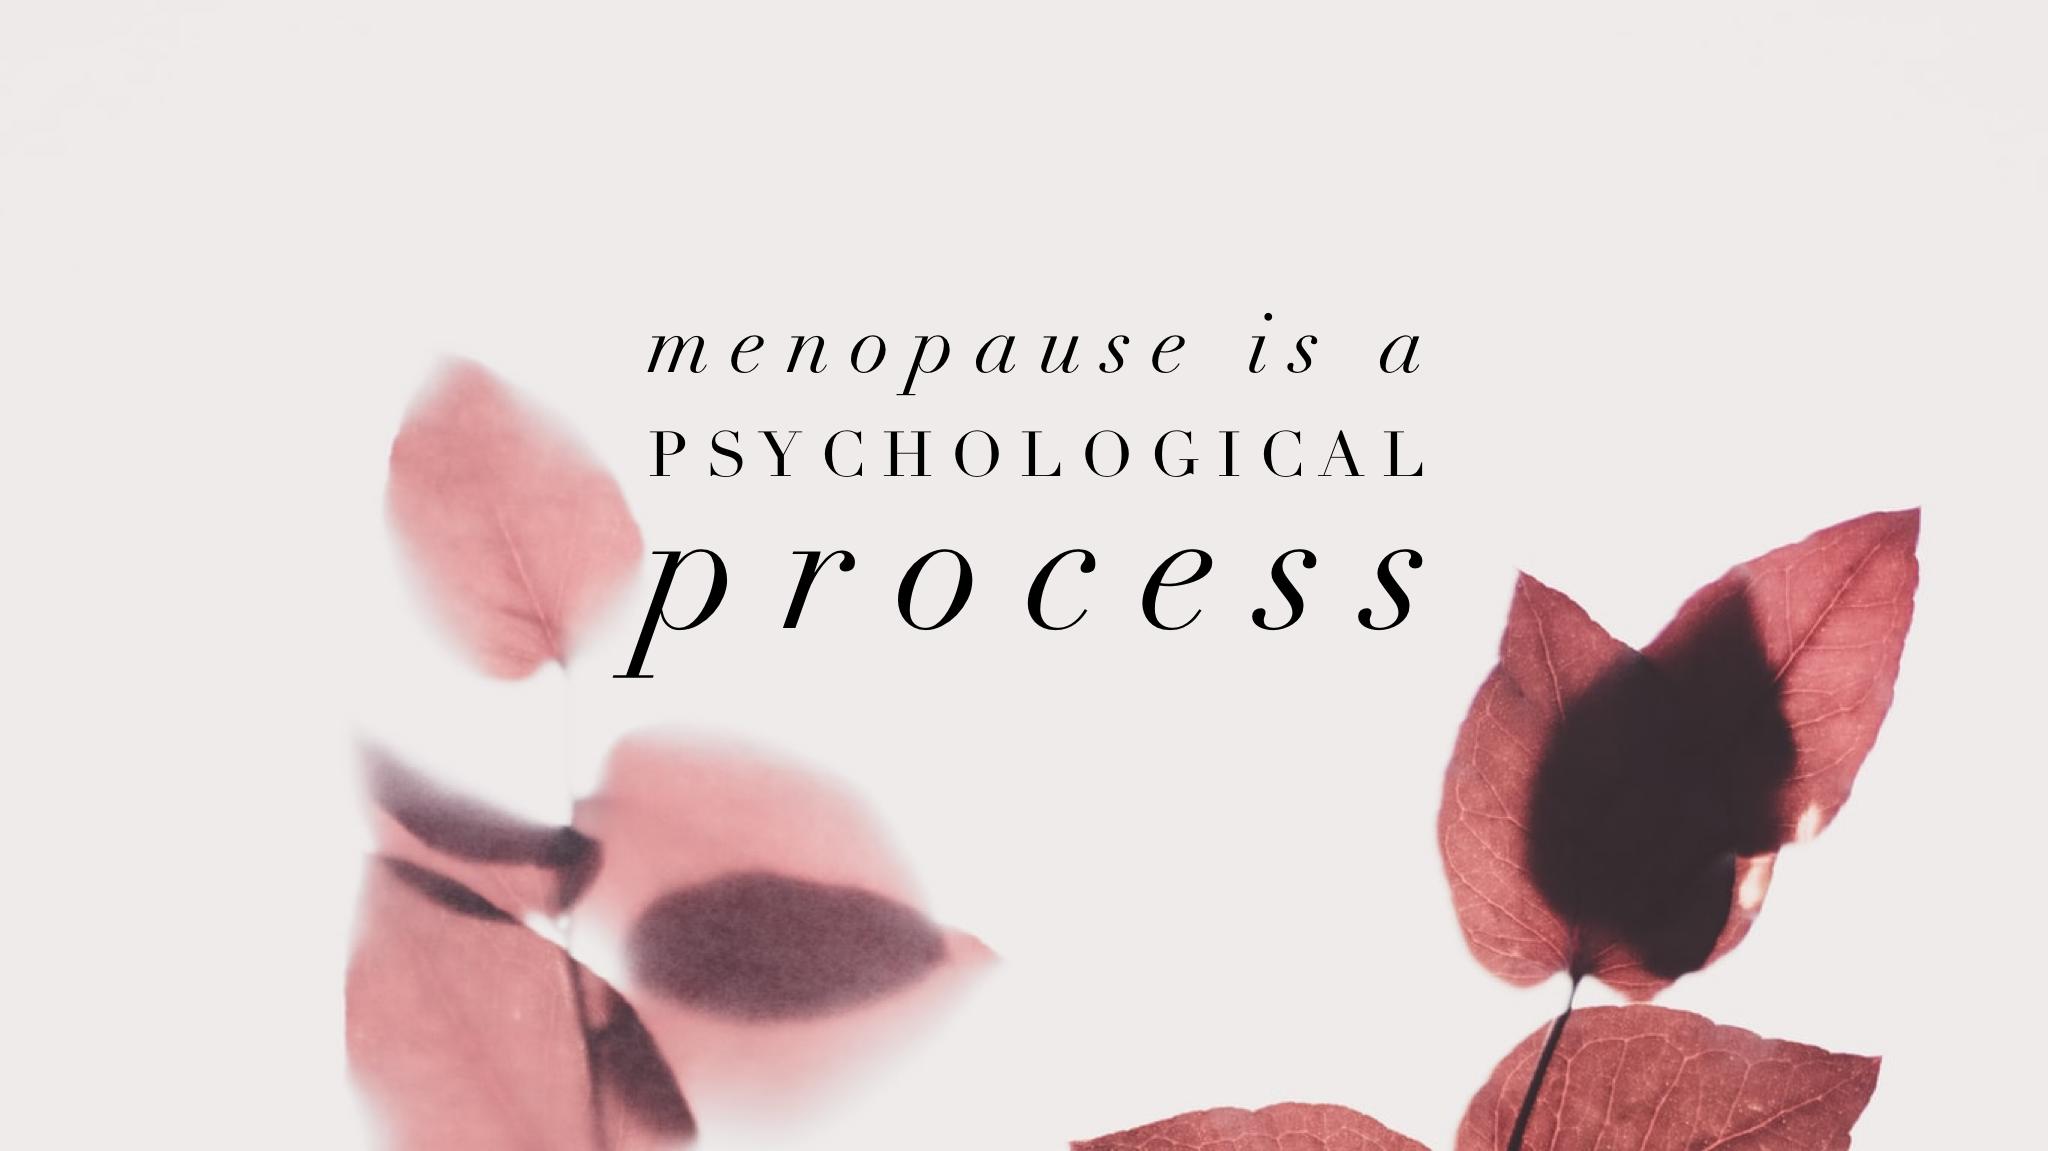 menopause-psychological-process